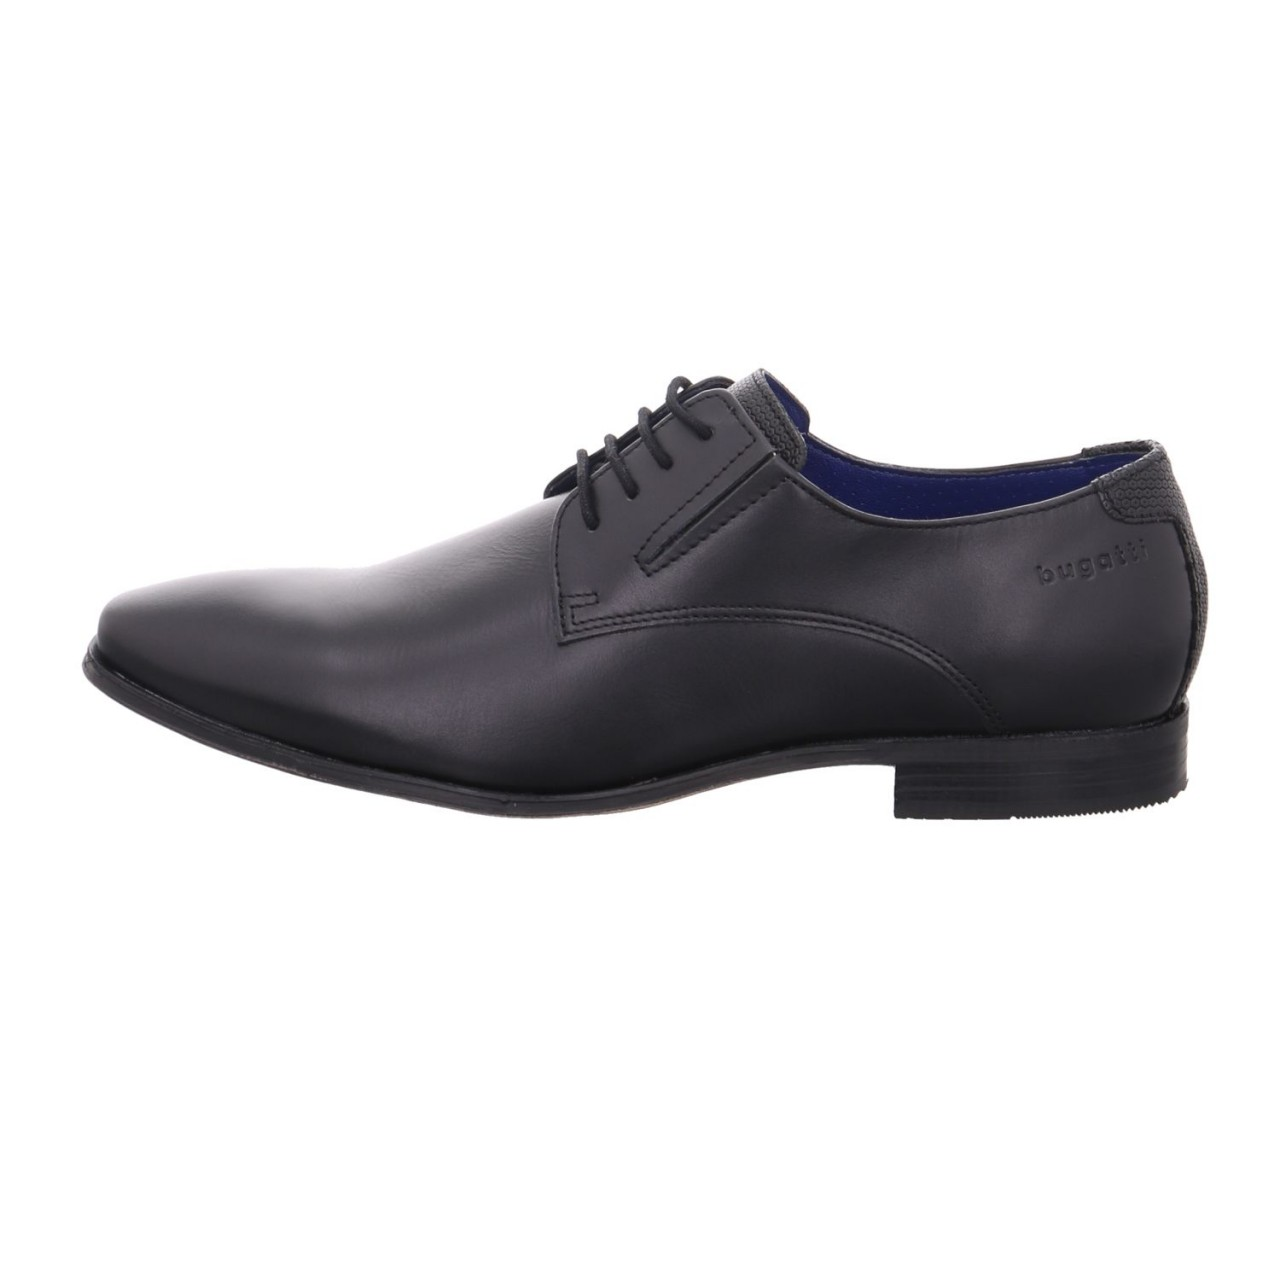 Bugatti Business schwarz schwarz Schuhe Bugatti Business qwx84H5X